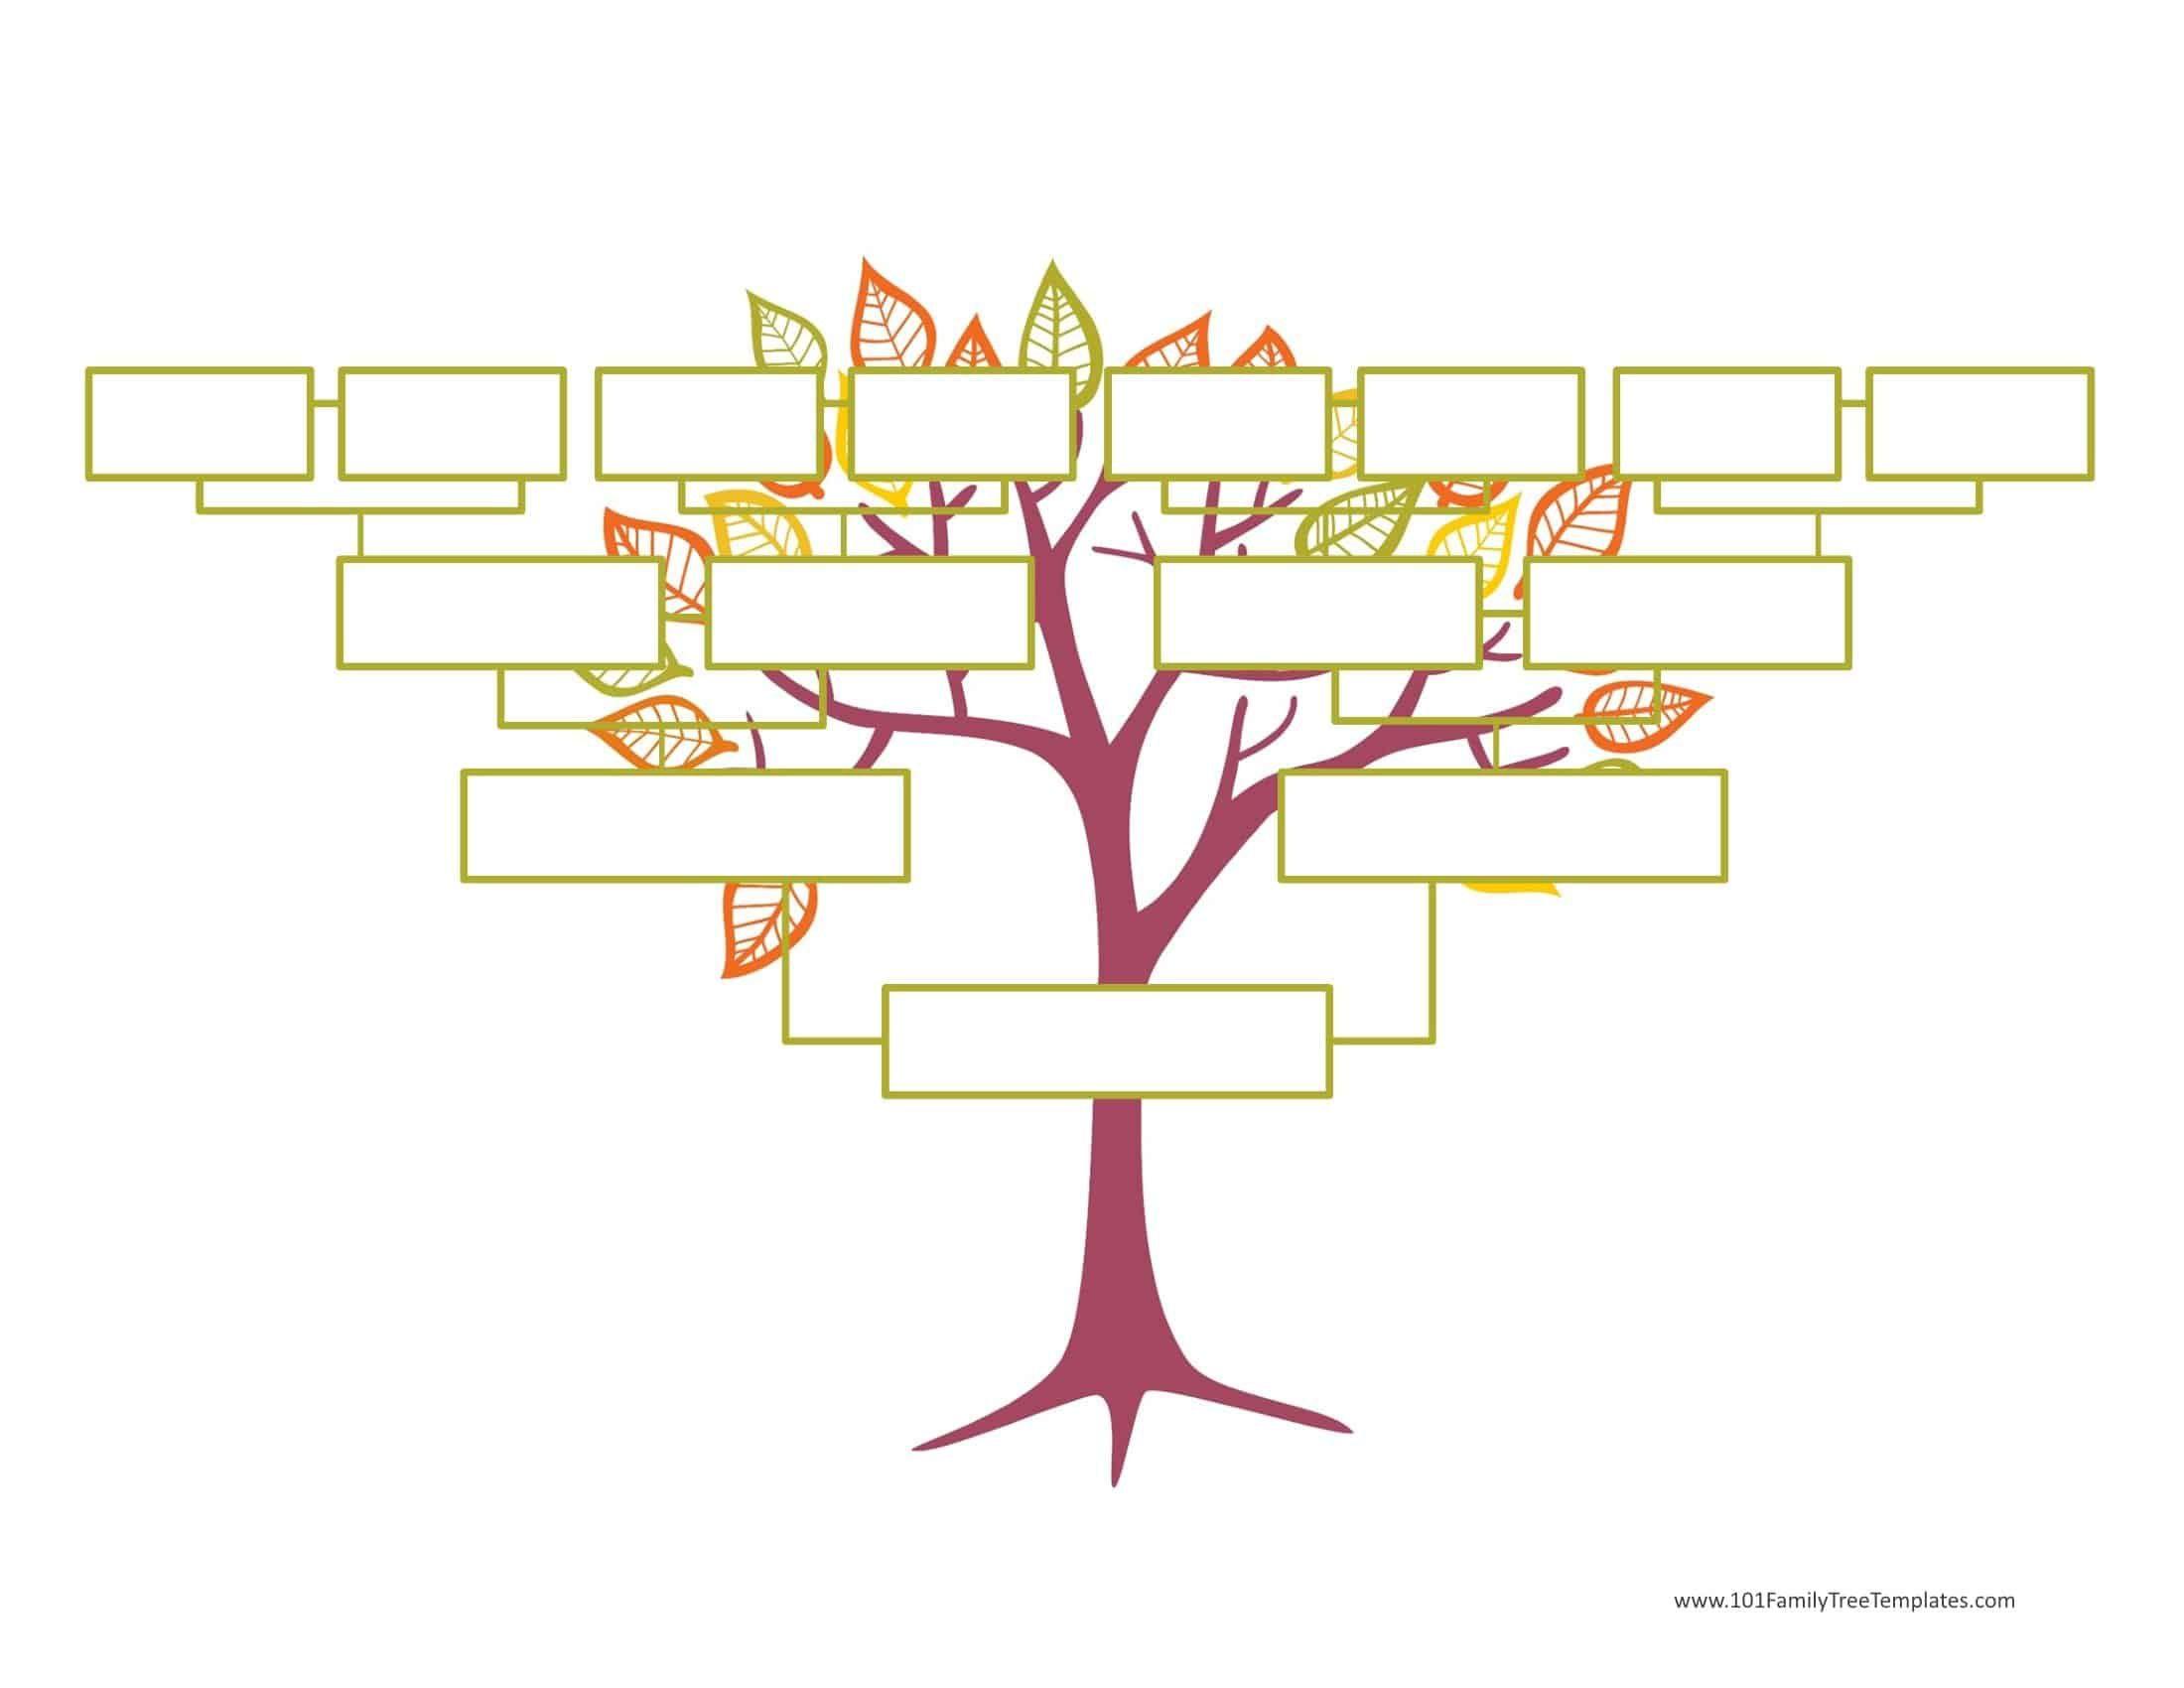 004 Wonderful Editable Family Tree Template Online Free Highest Clarity Full